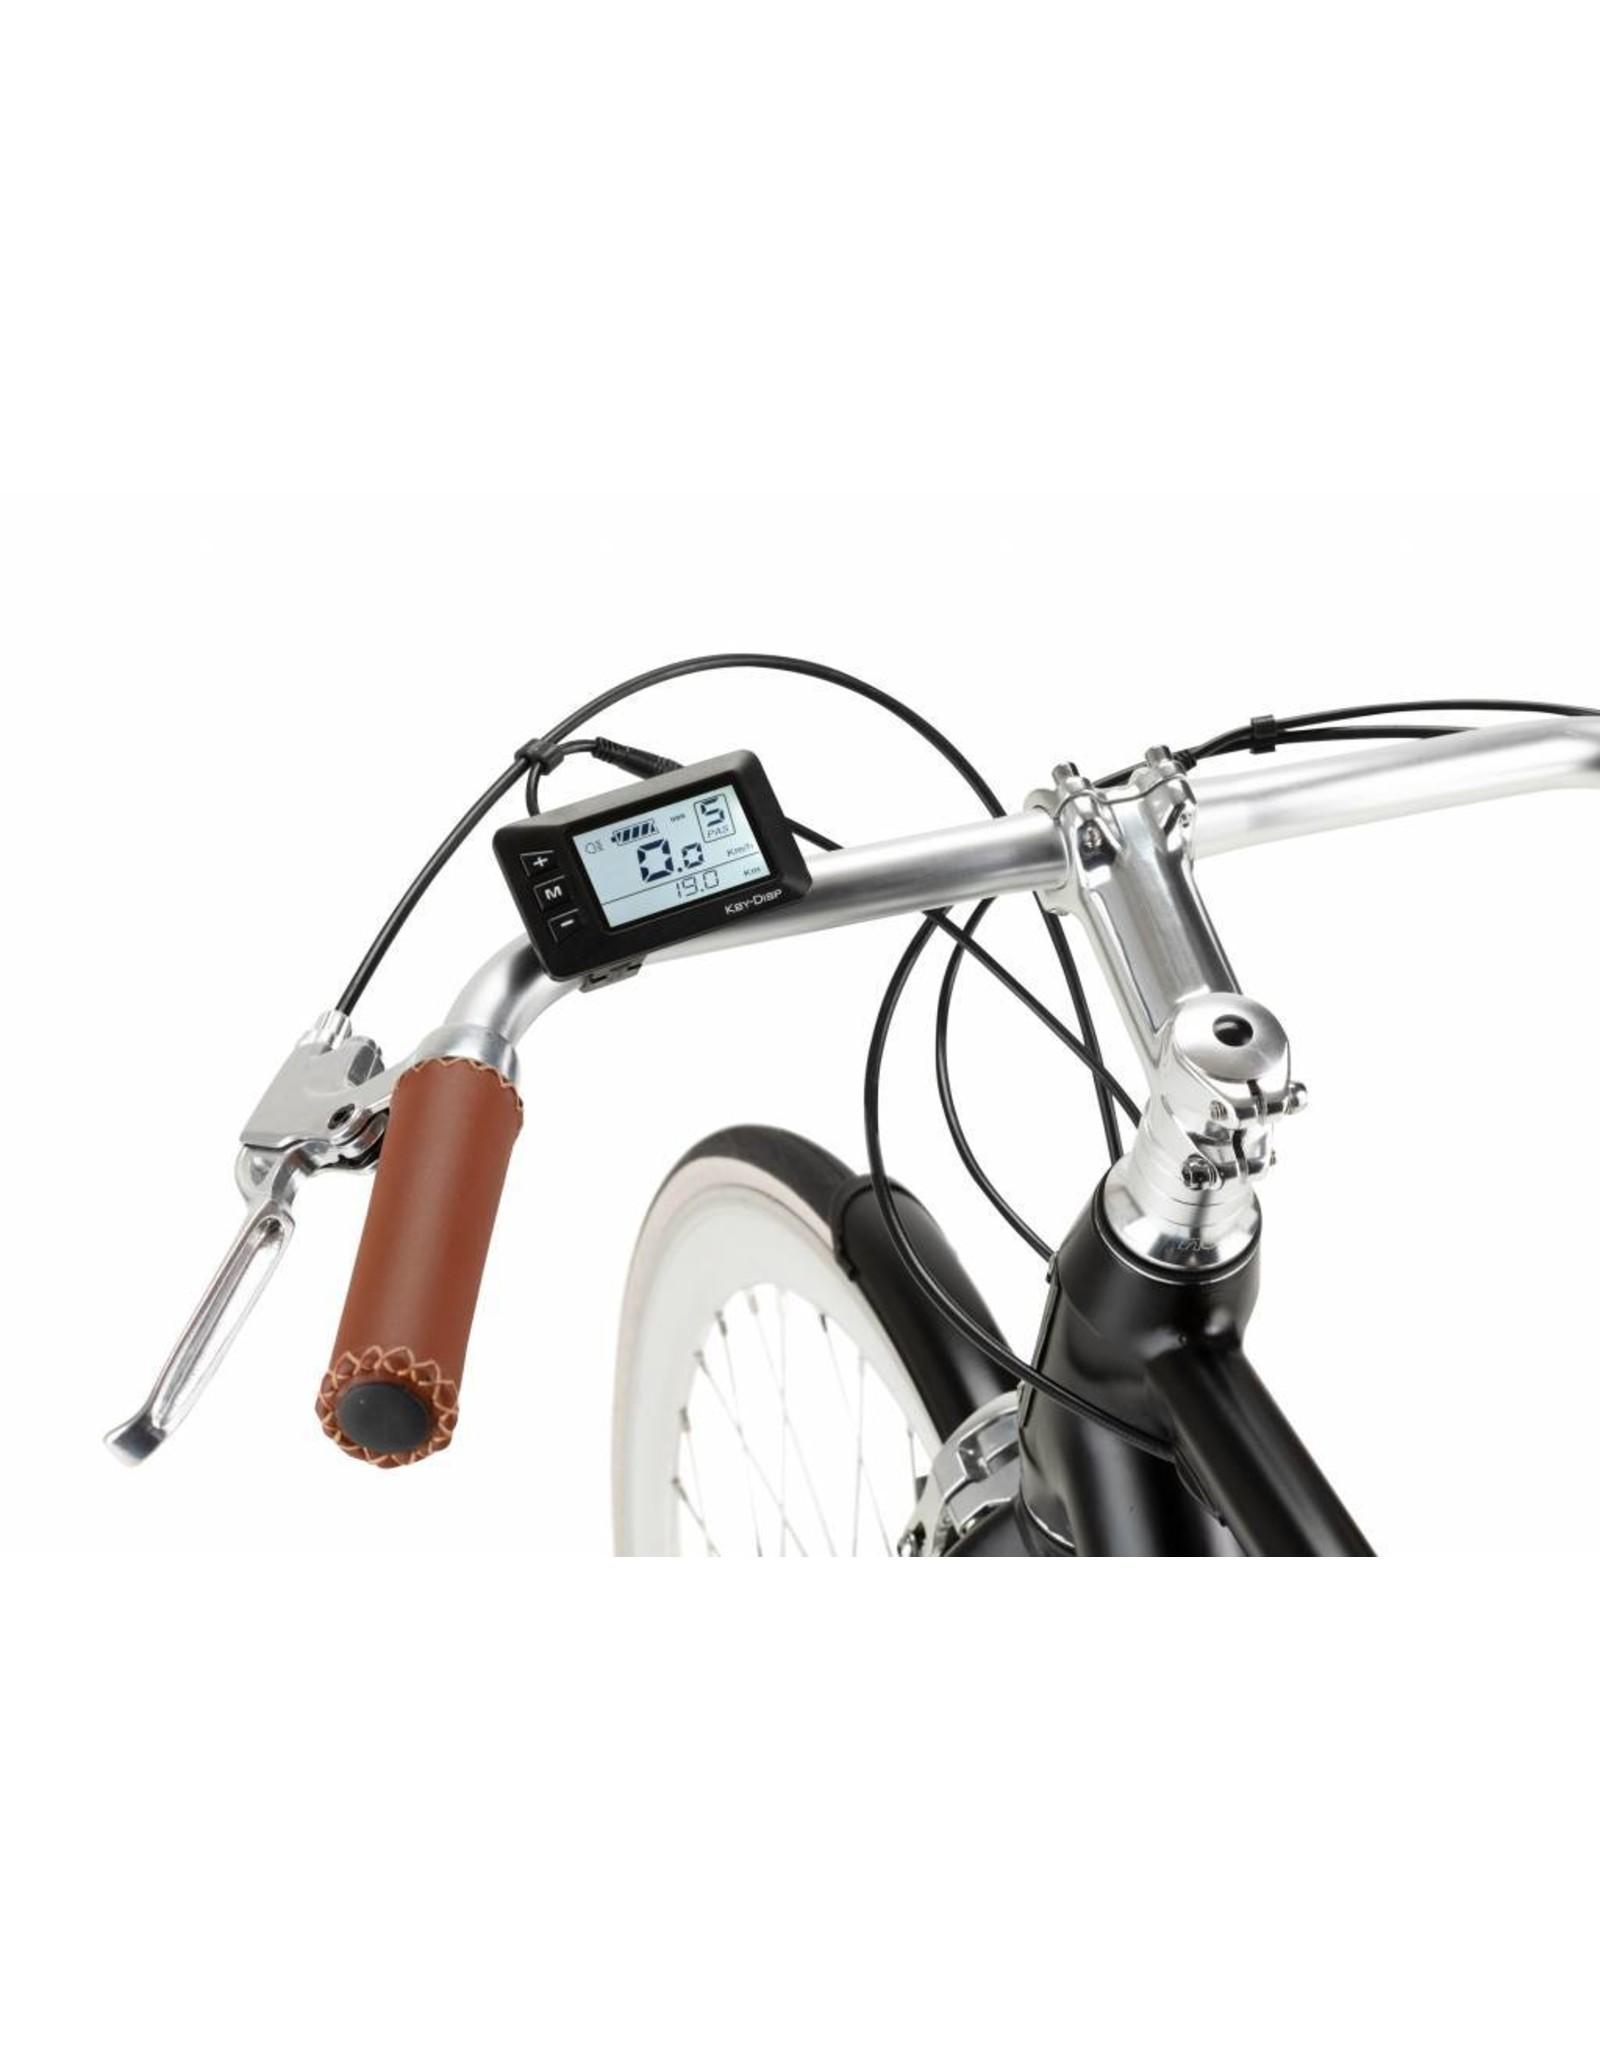 WATT Mobility MONTREAL MALE